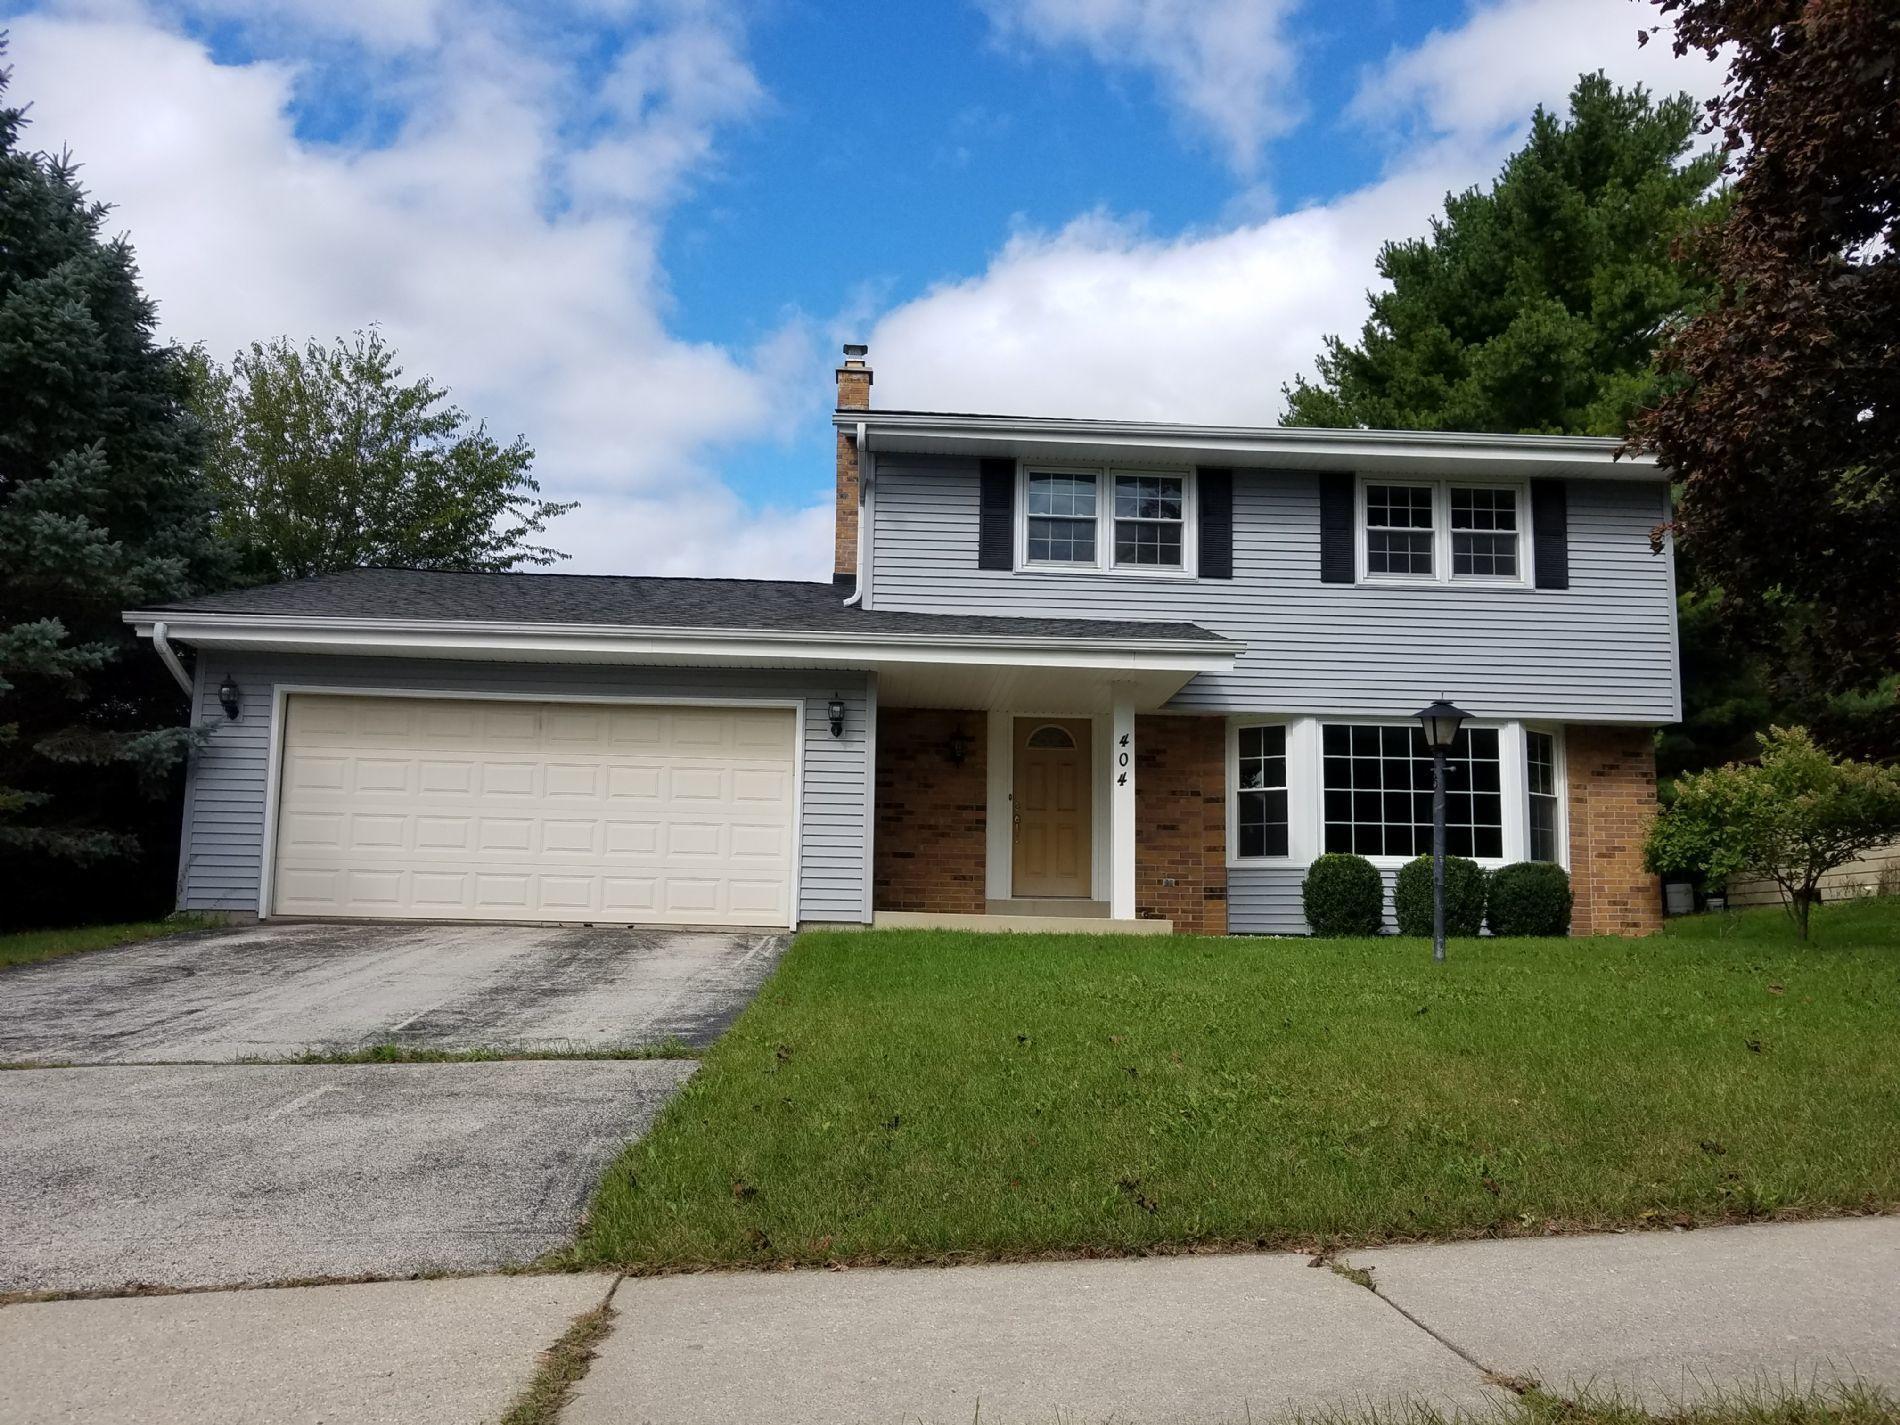 404 Hartwood Ln, Hartland, Wisconsin 53029, 4 Bedrooms Bedrooms, ,1 BathroomBathrooms,Single-Family,For Sale,Hartwood Ln,1663416